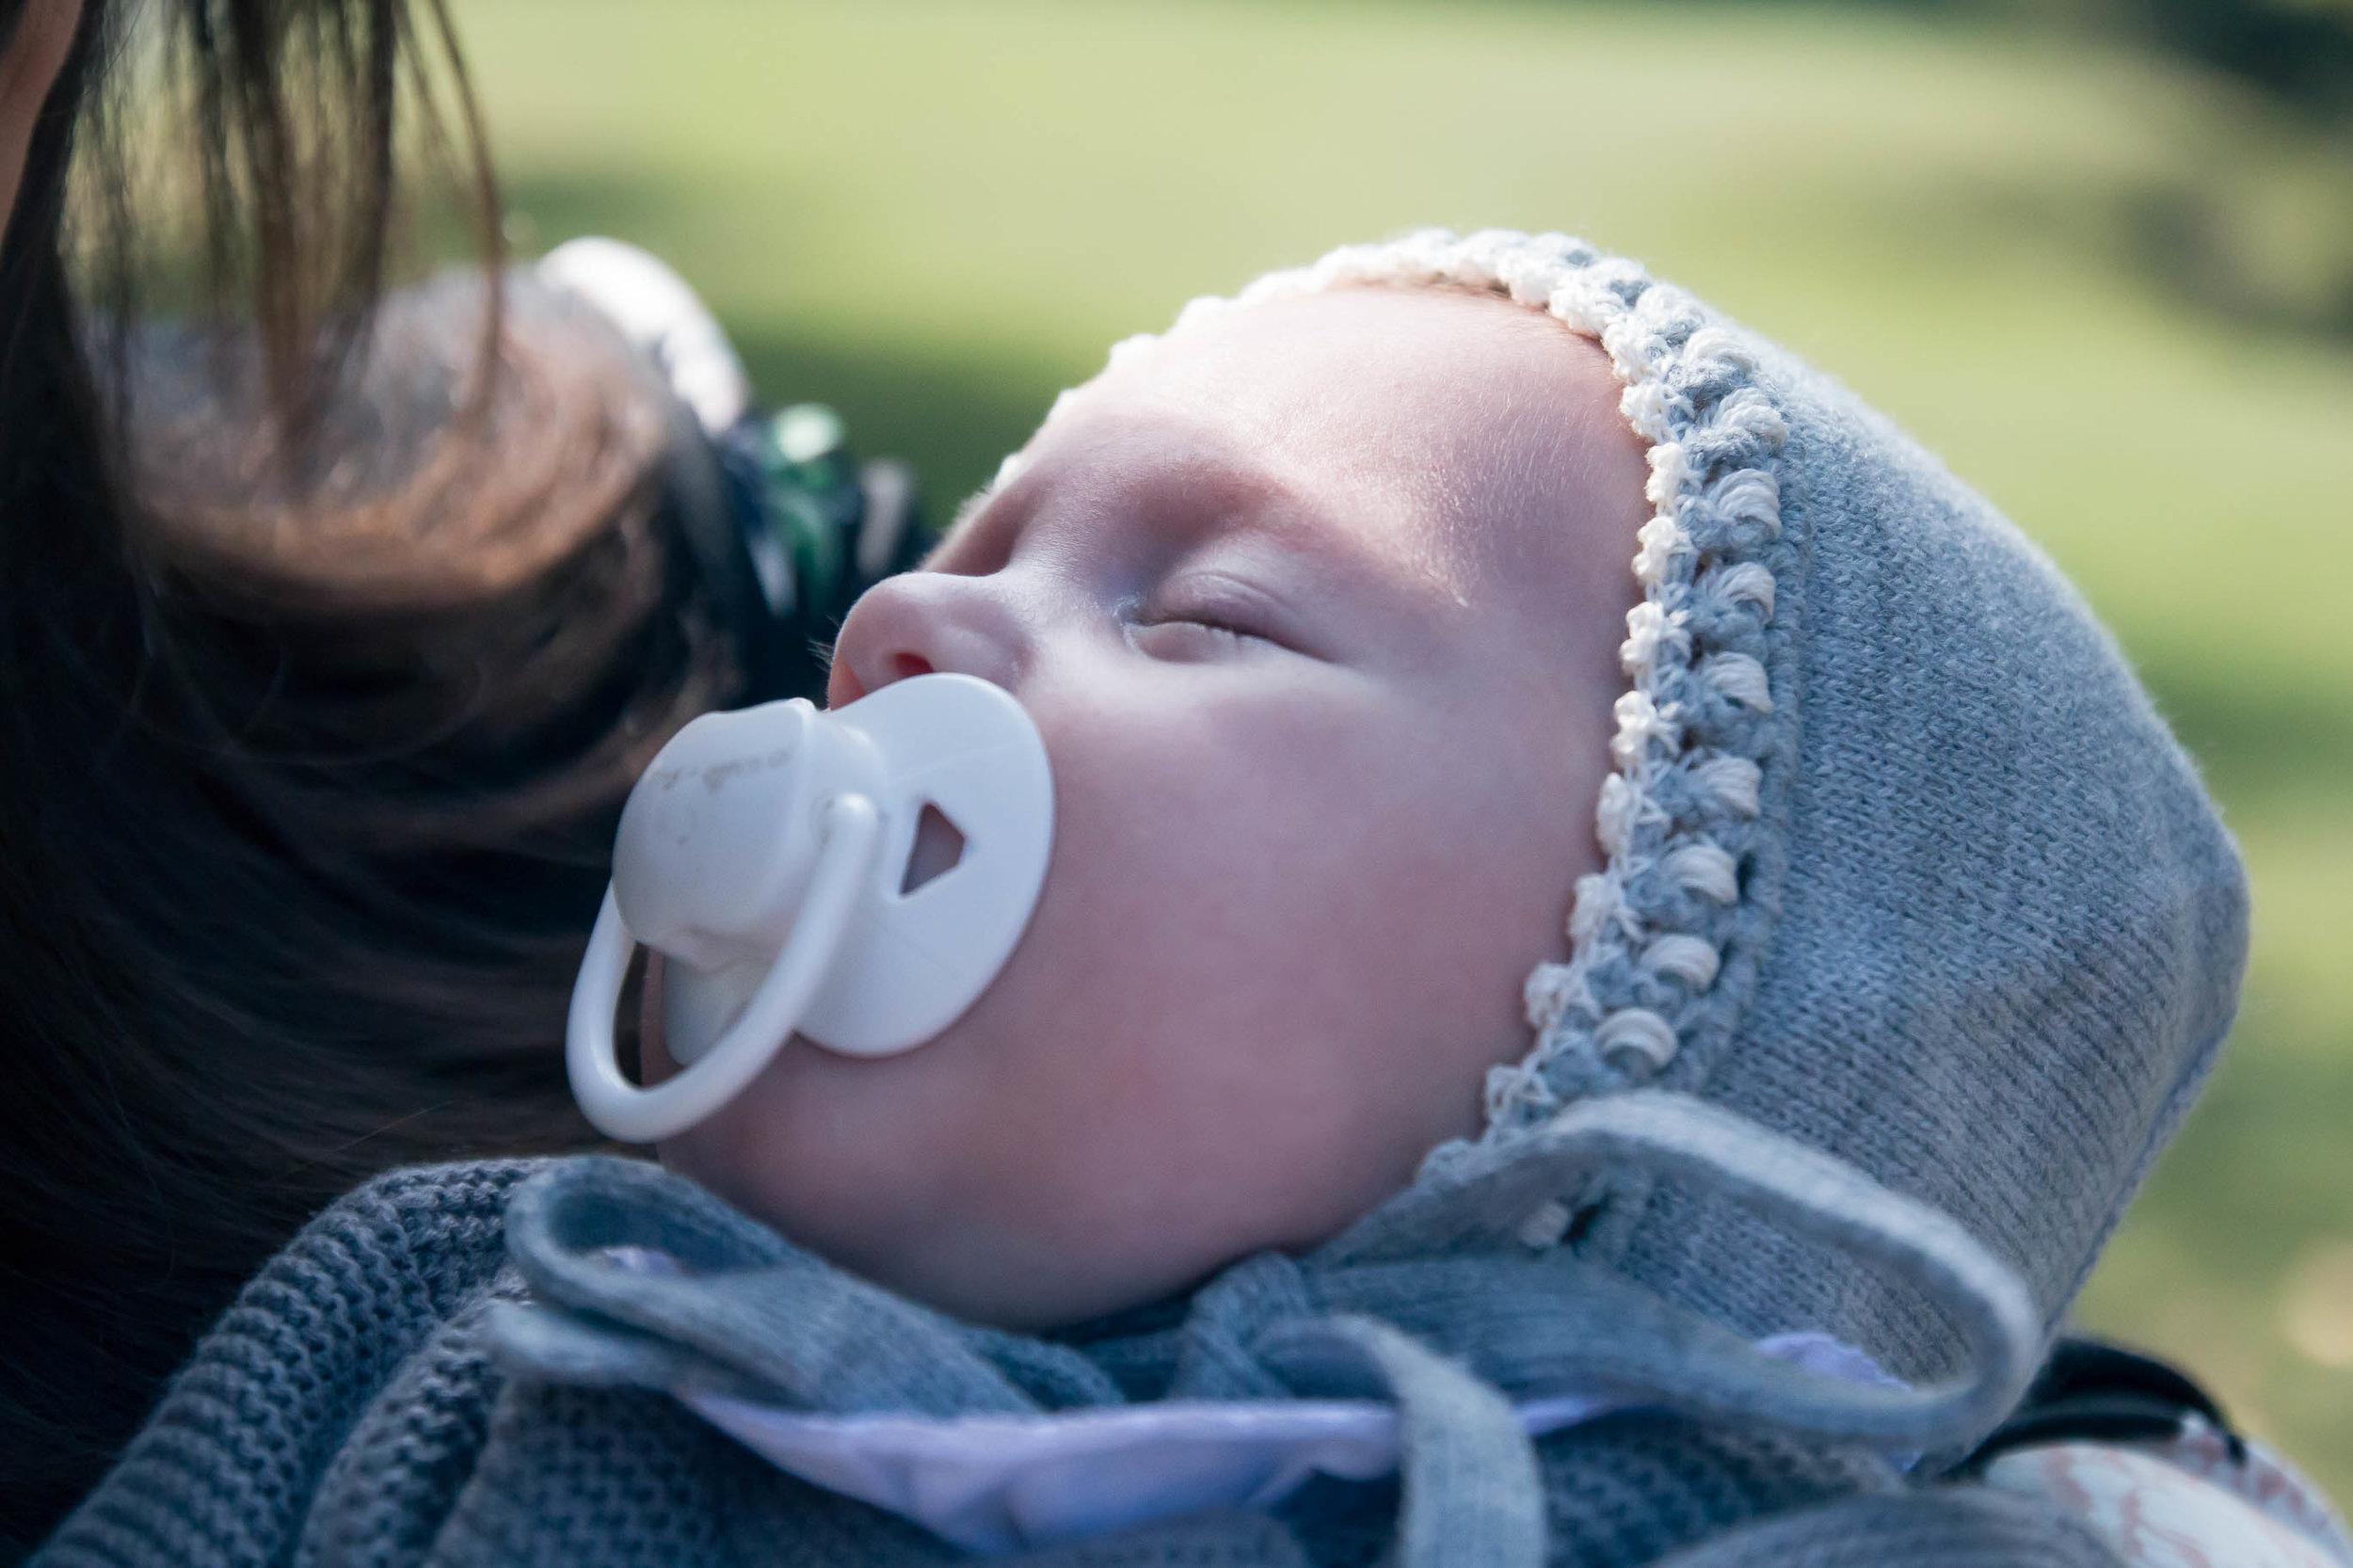 bautizo en pola de lena asturias fotografo bebes-3.JPG